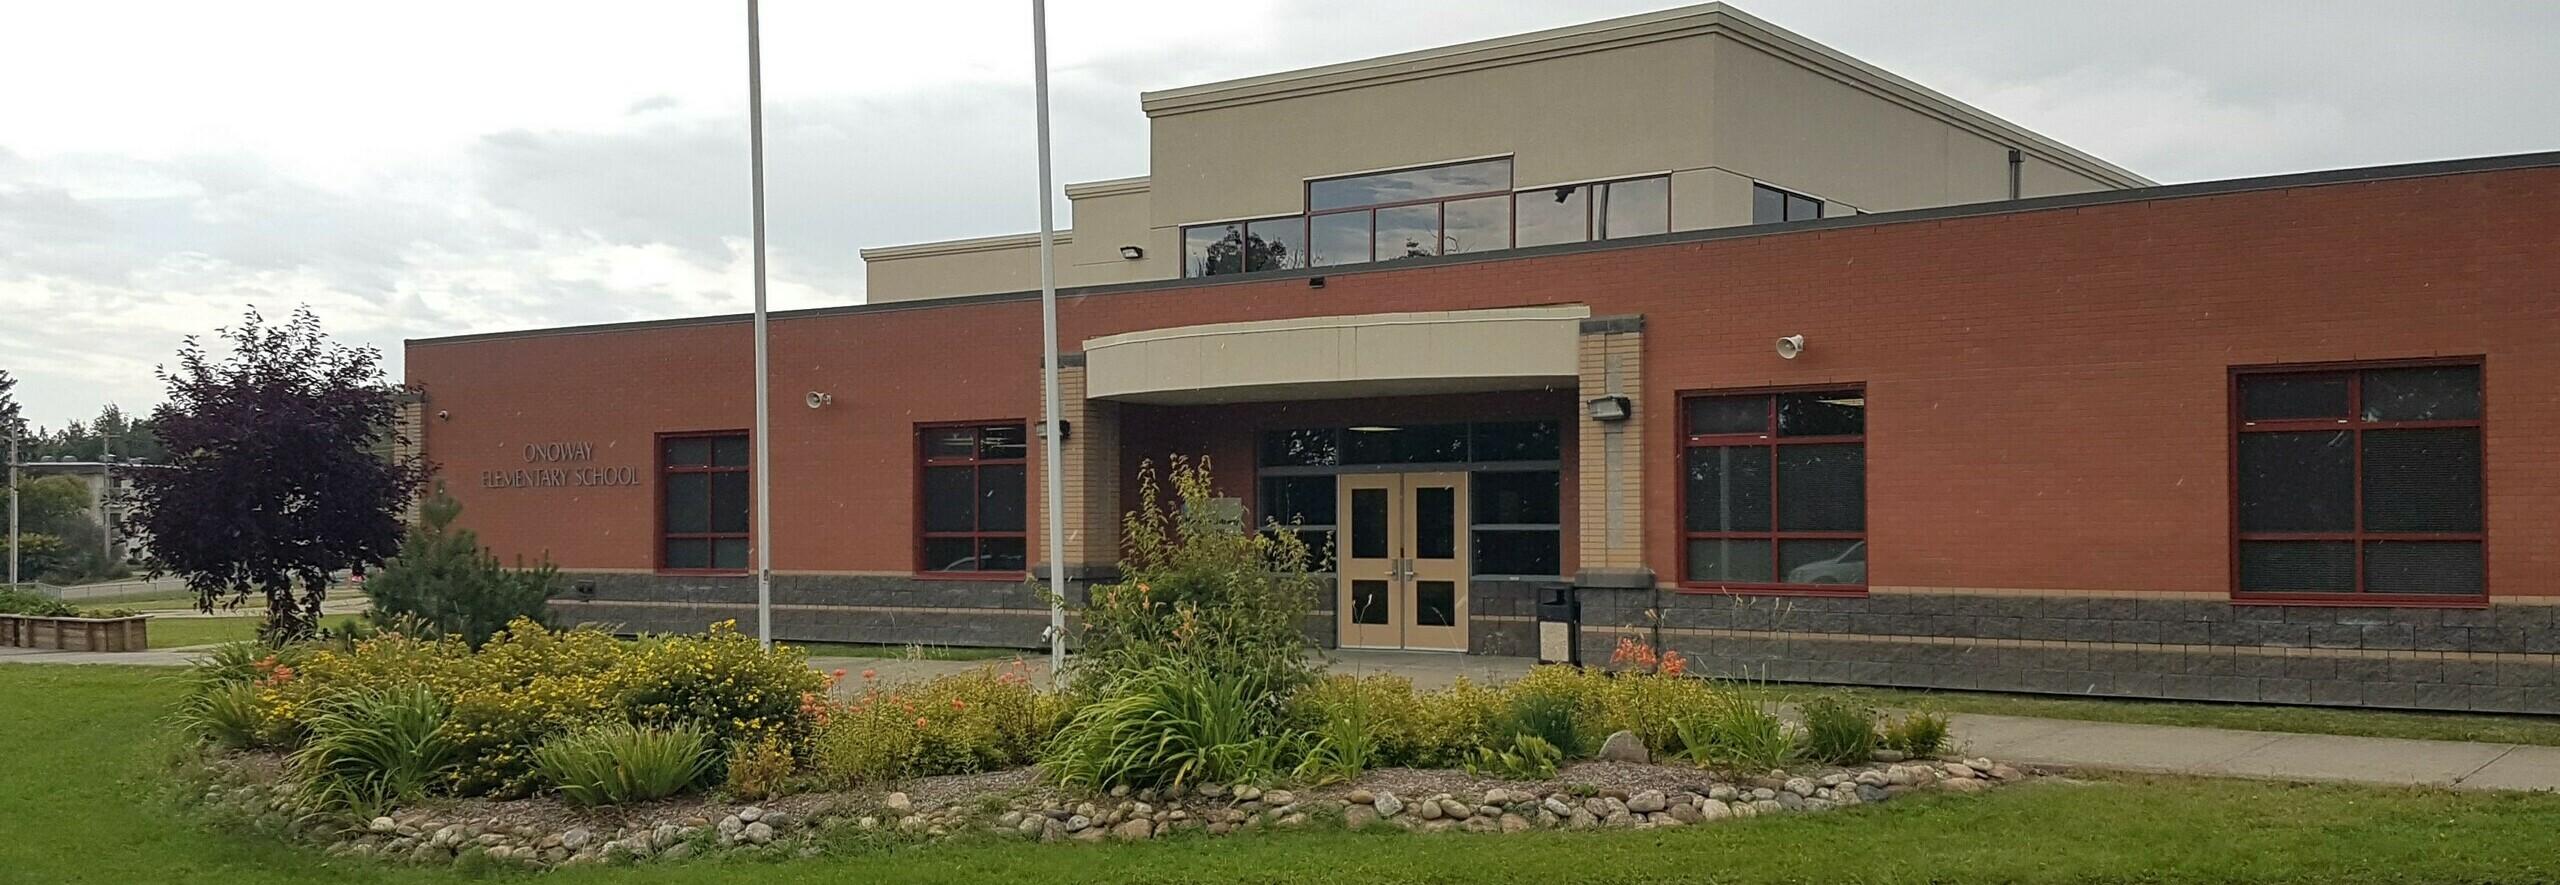 Onoway Elementary School Banner Photo